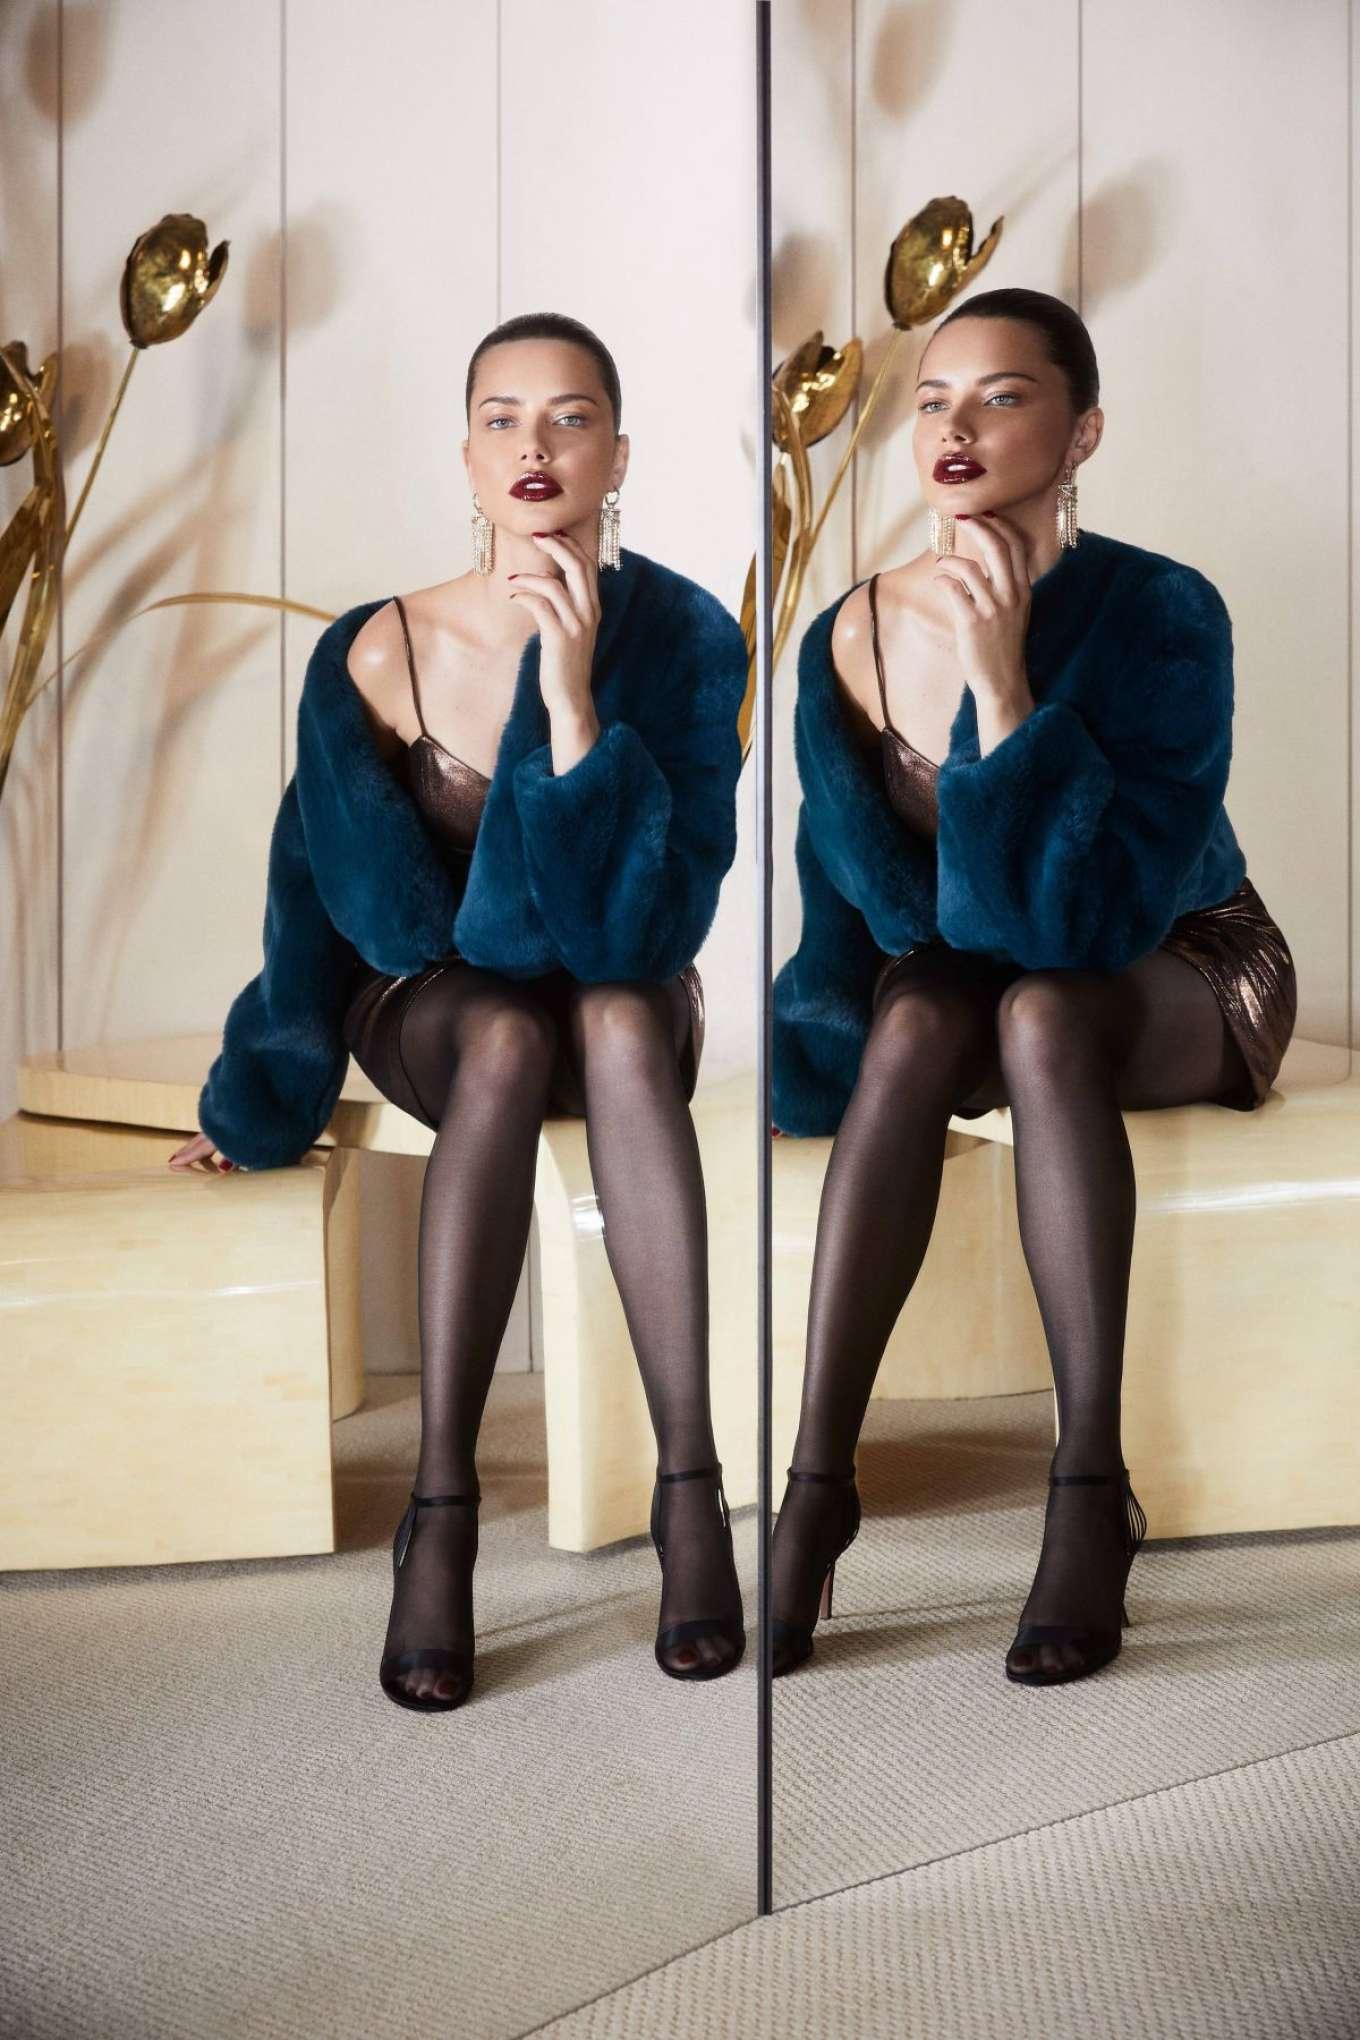 Adriana Lima 2019 : Adriana Lima – 2019 BCBG Max Azria Campaign-03